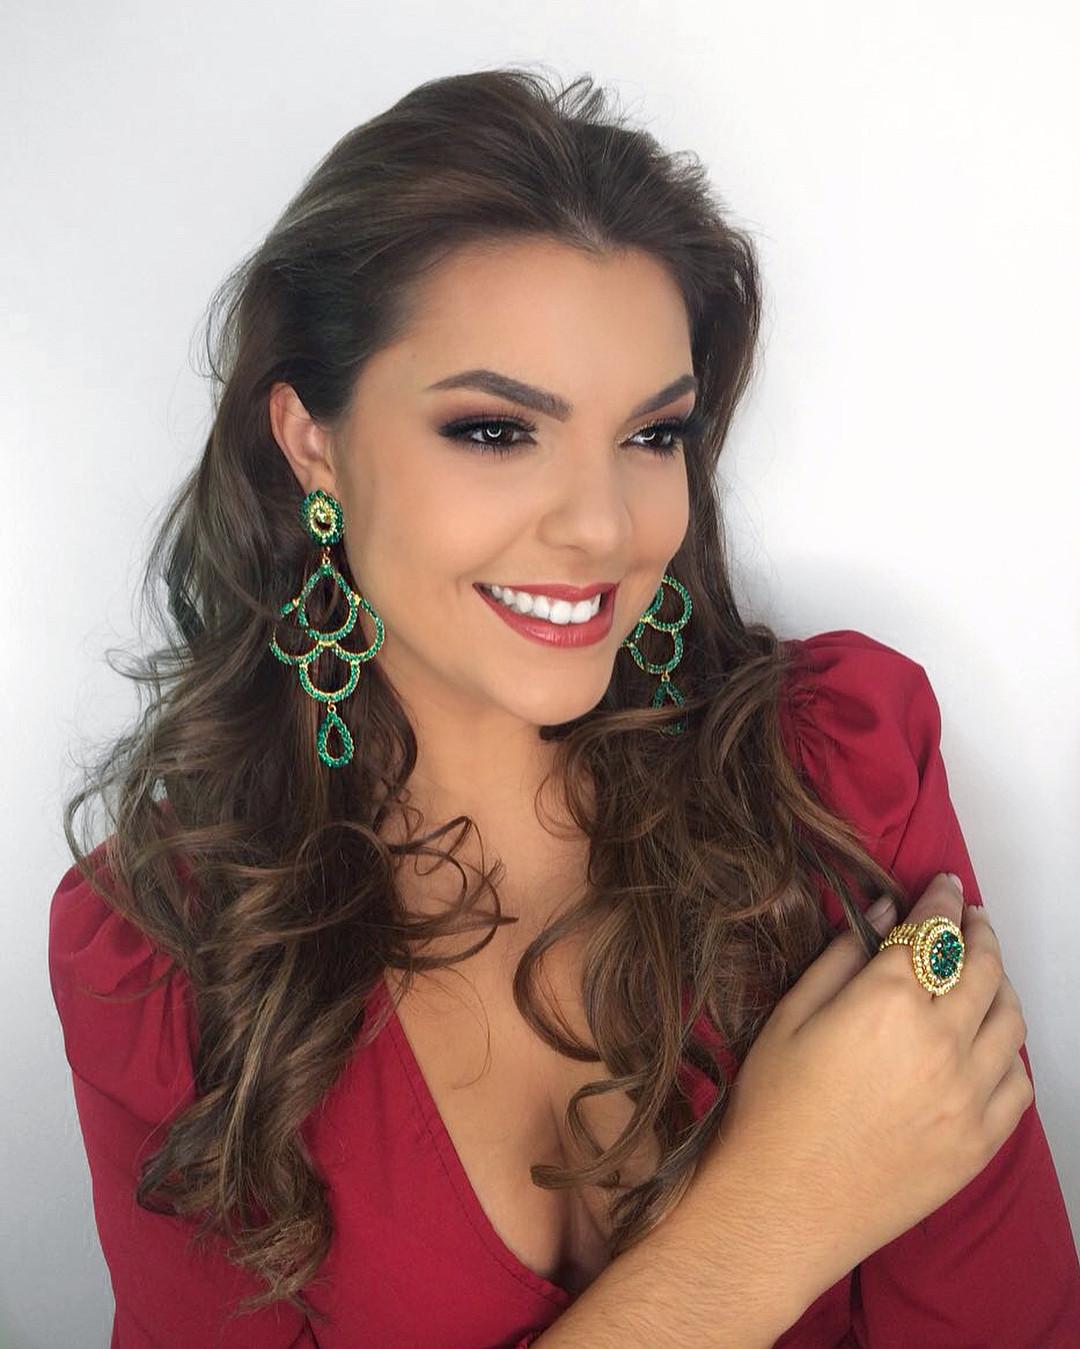 jessica poeta lirio, miss friendship brazil 2021/top 10 de miss tourism queen international 2015. - Página 10 Bzlnqv10